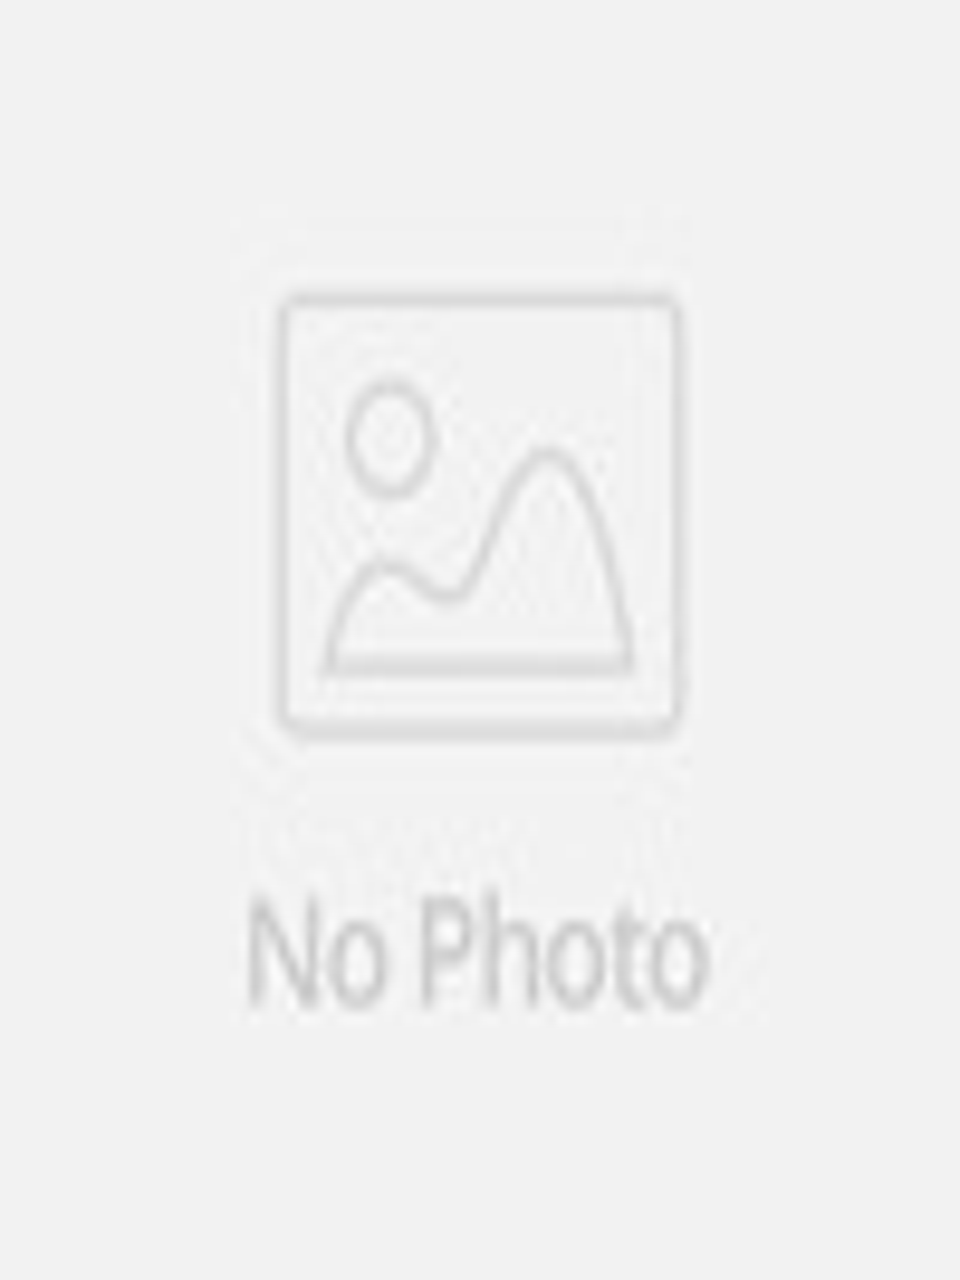 Wedding Dress Stores Near Chicago Il 6